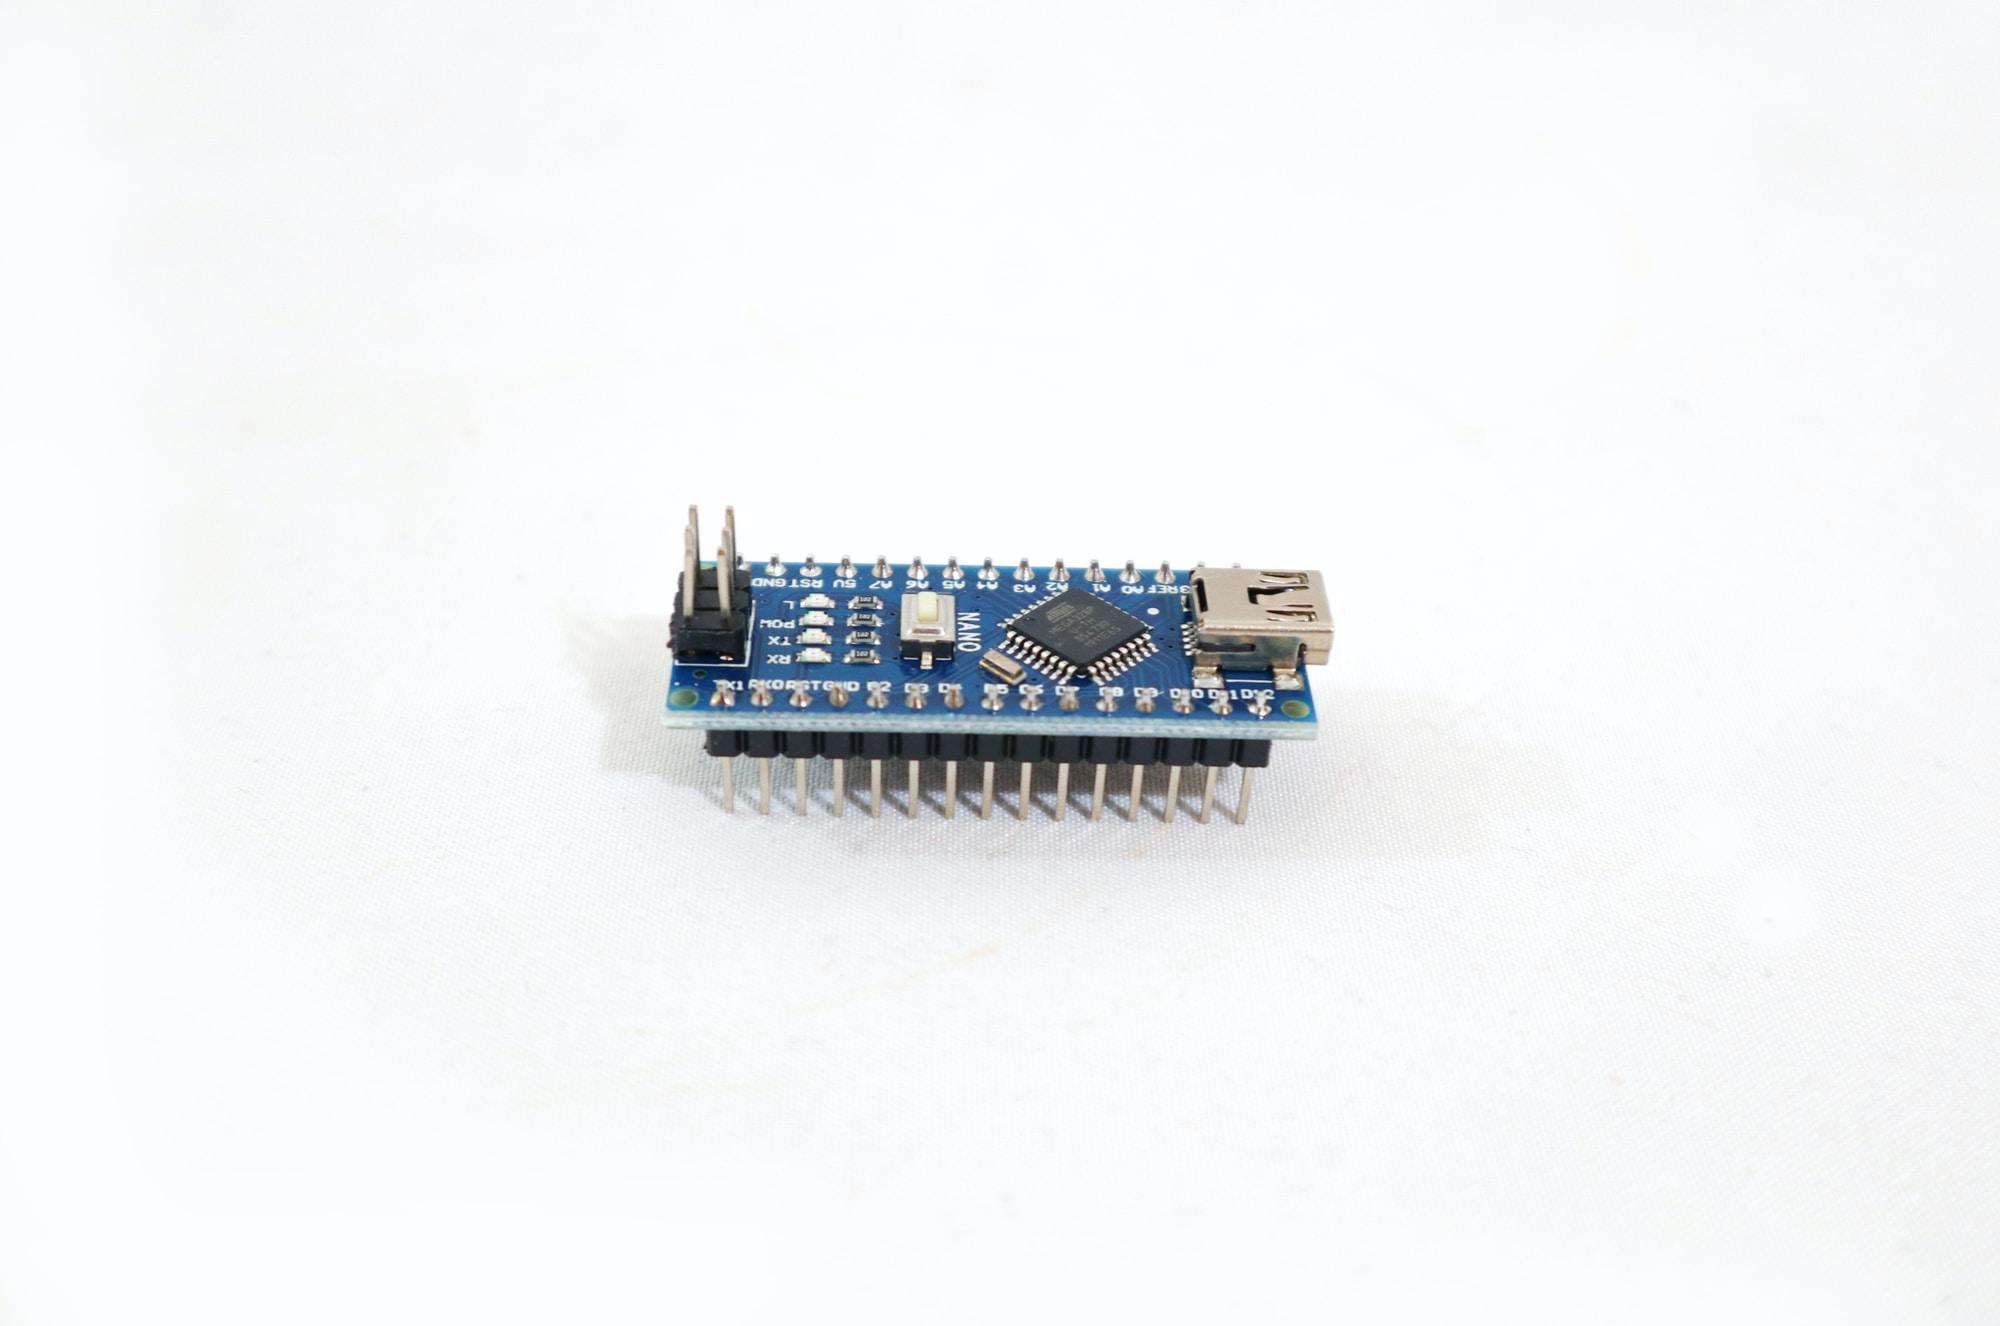 An arduino nano